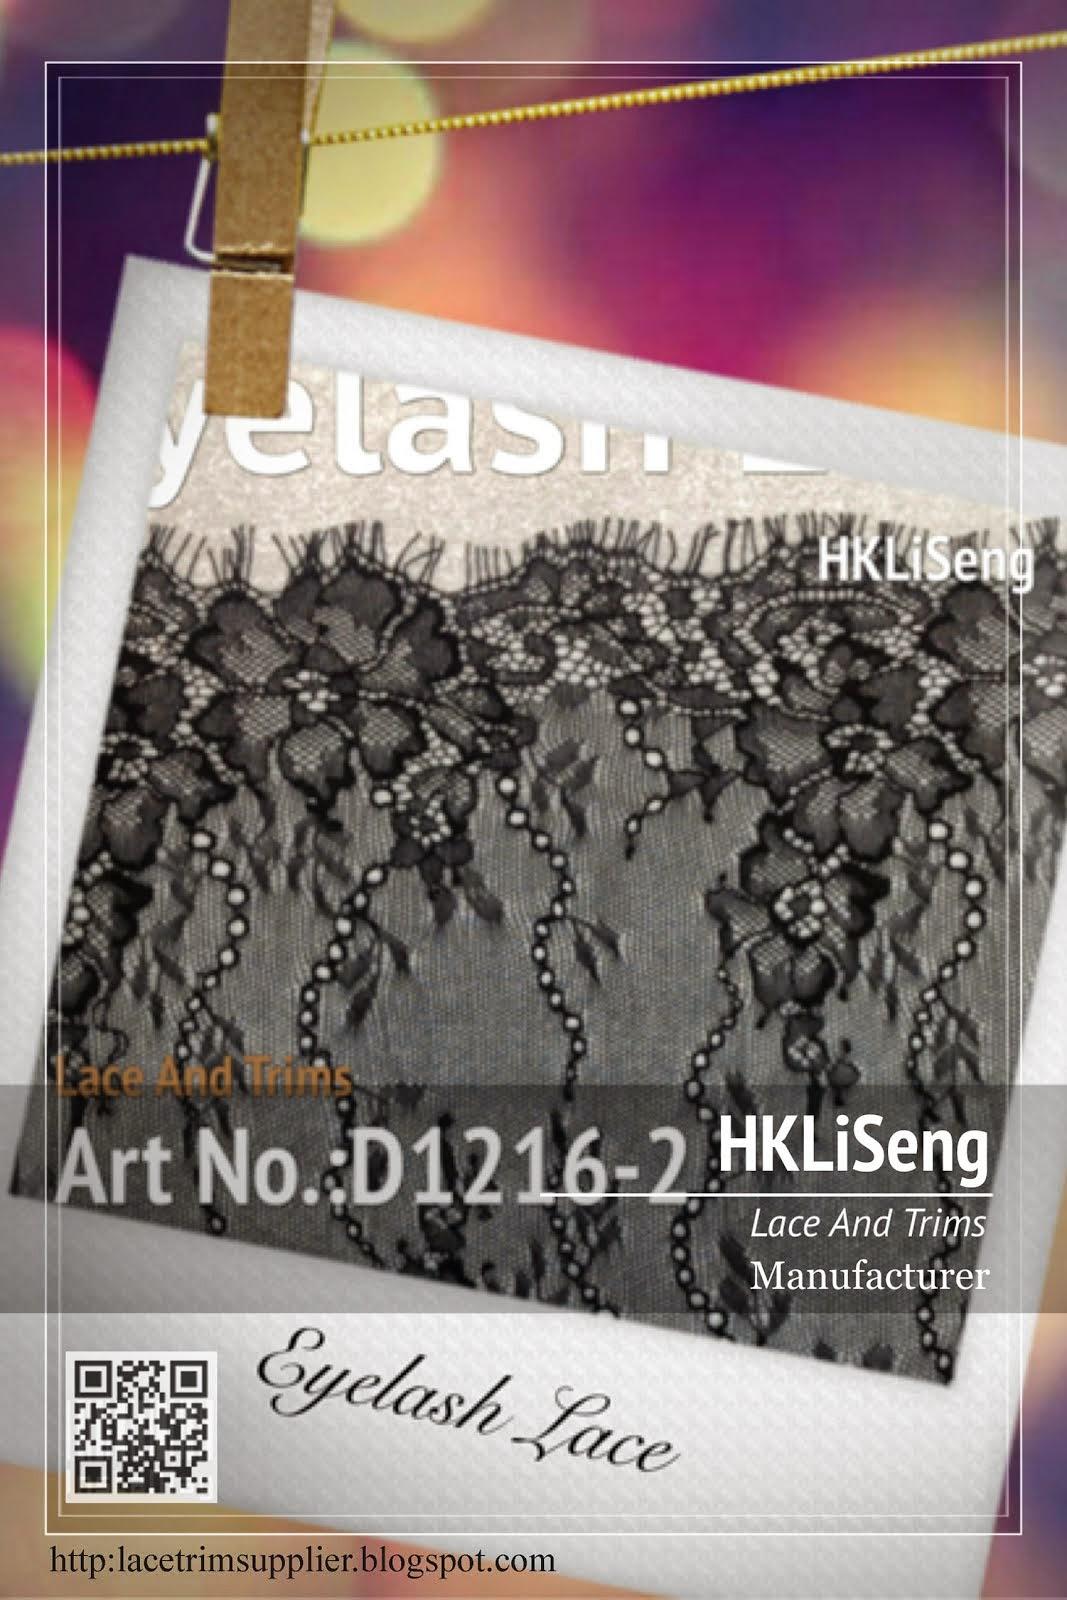 Eyelash Lace Manufacturer - Hong Kong Li Seng Co Ltd